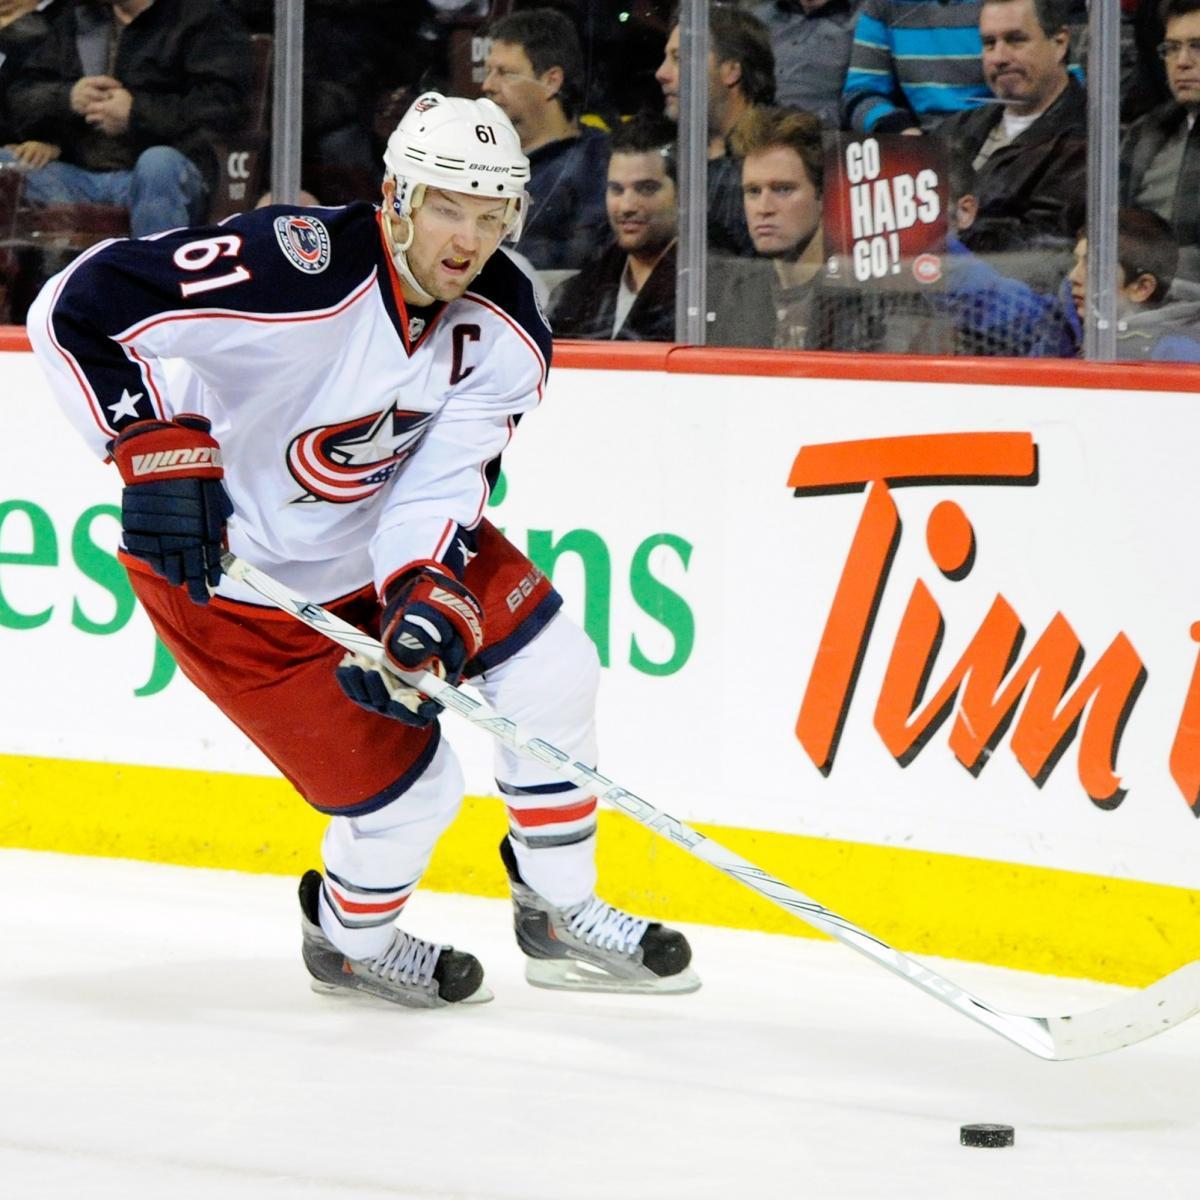 Report: Leafs GM Brian Burke Talks With Blue Jackets GM